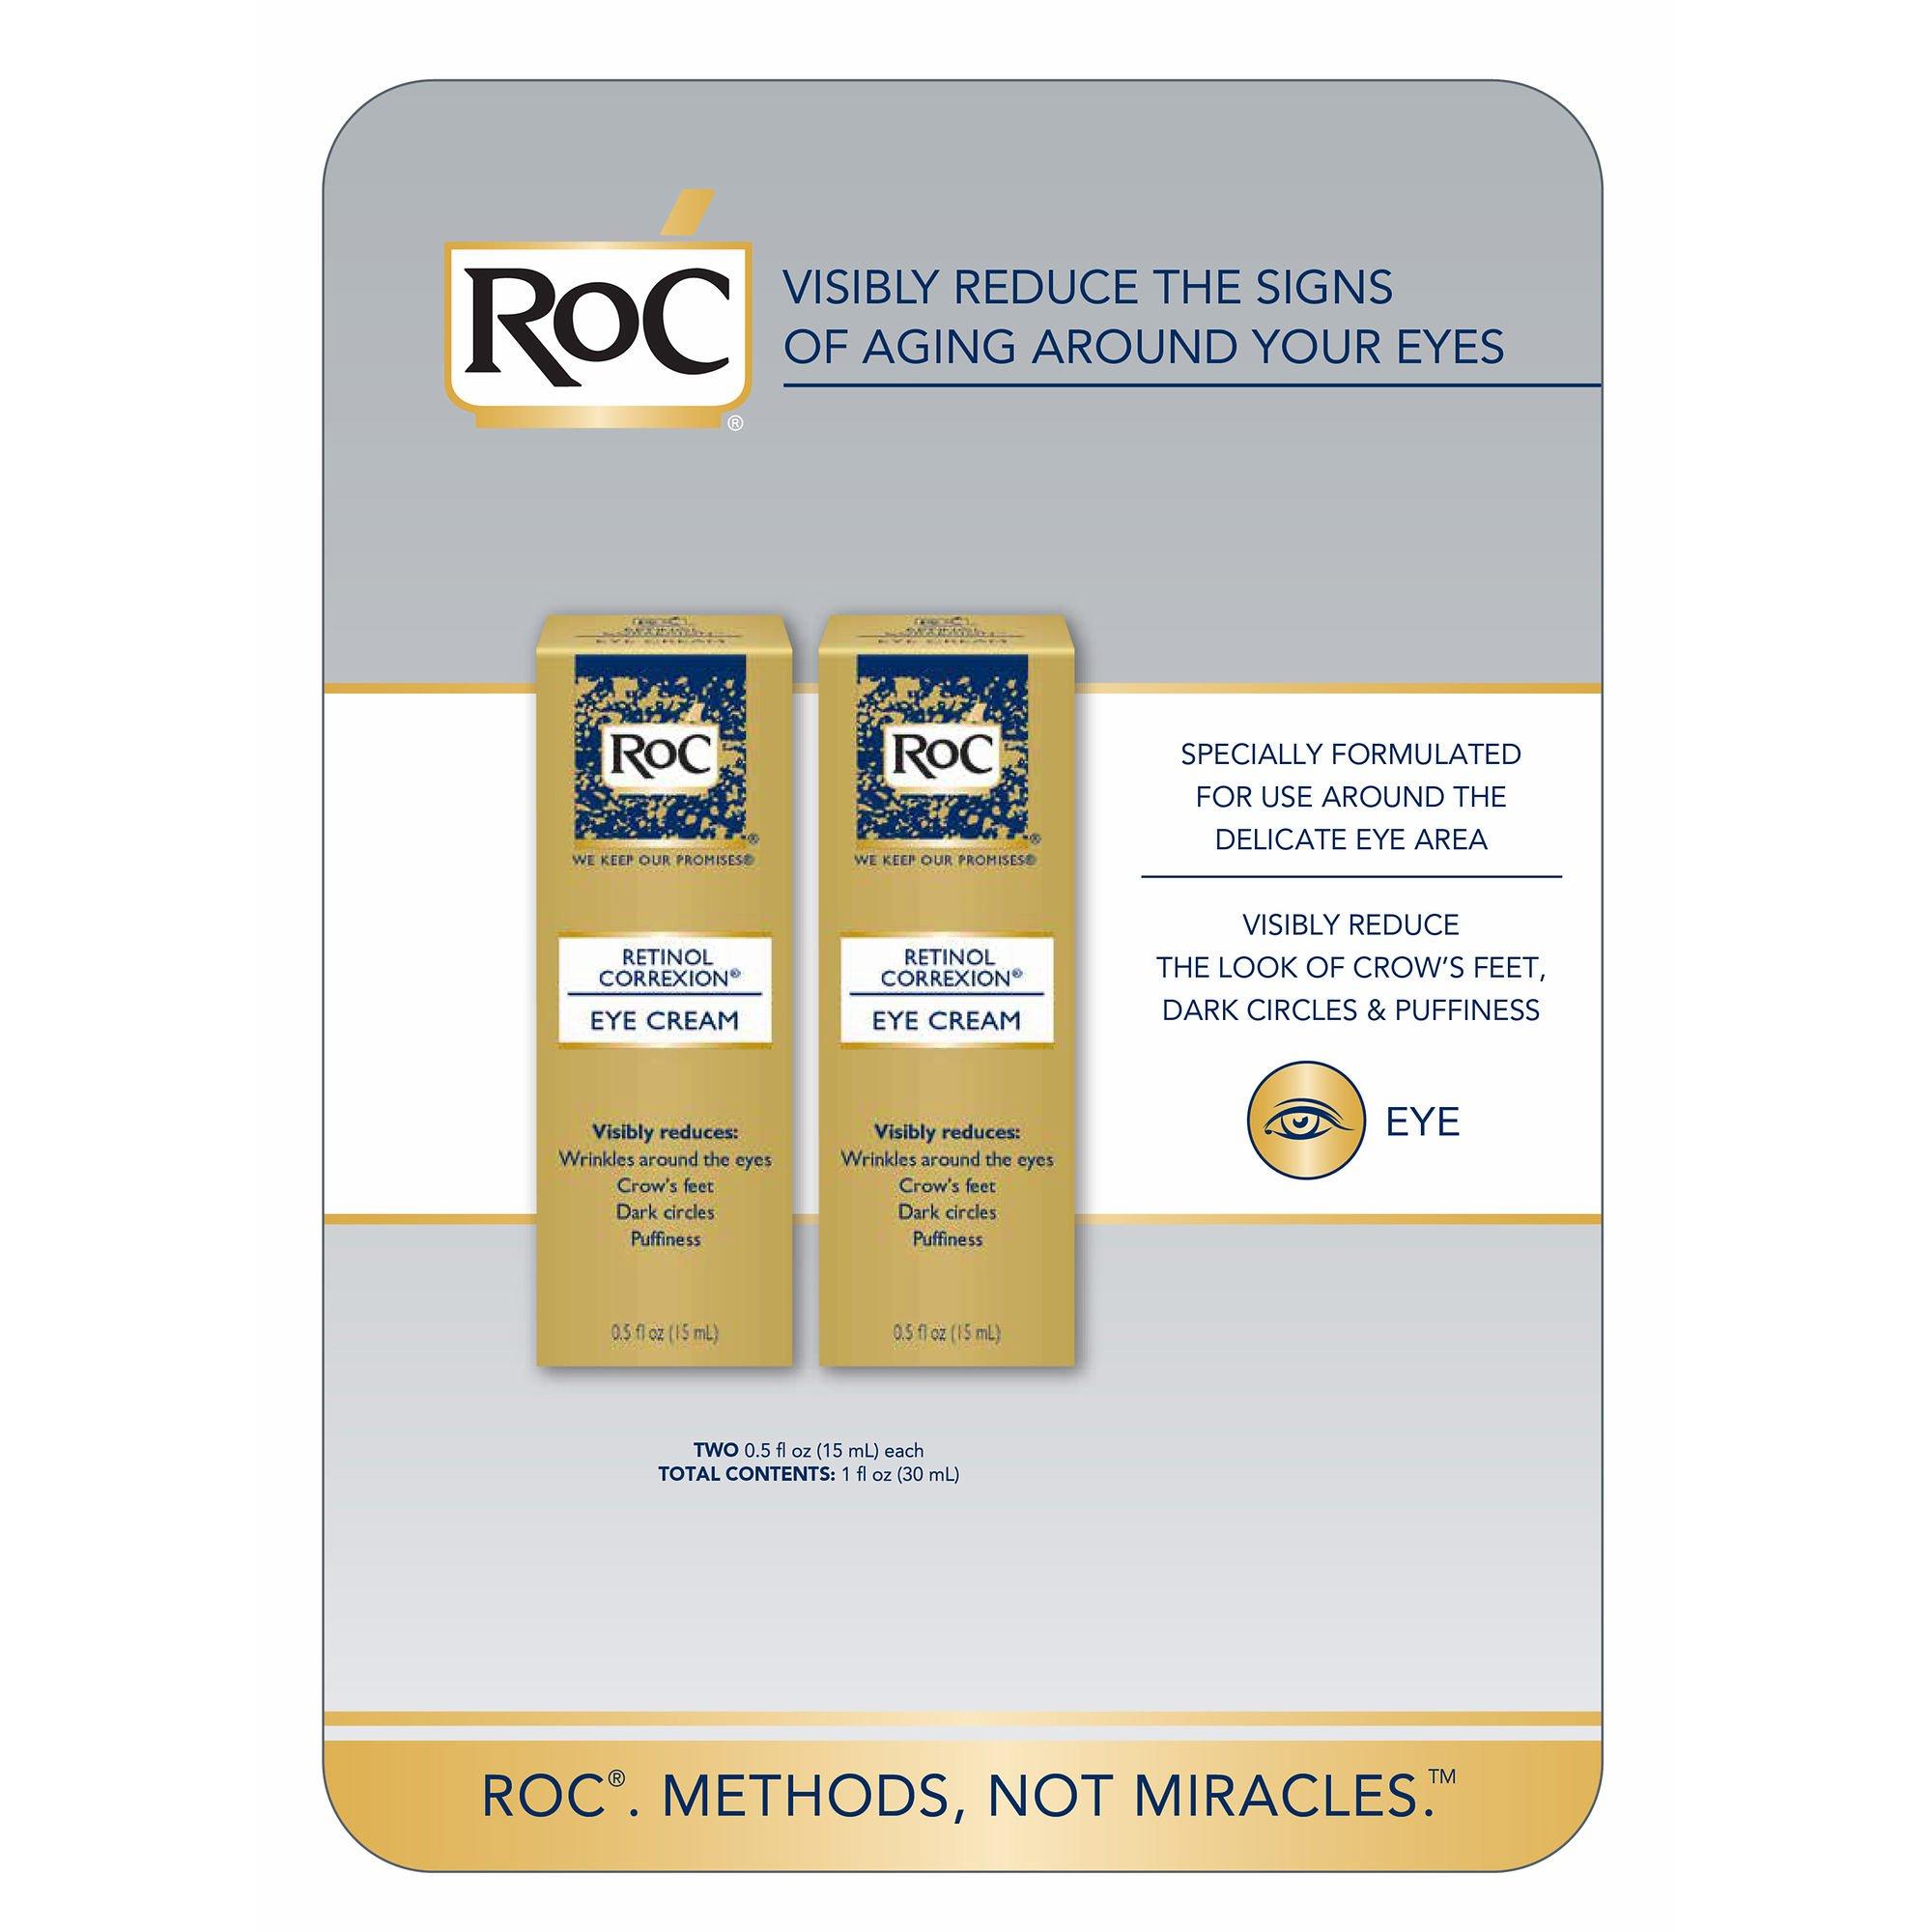 RoC Retinol Correxion Eye Cream 2-pack 0.5 oz (15ml) each